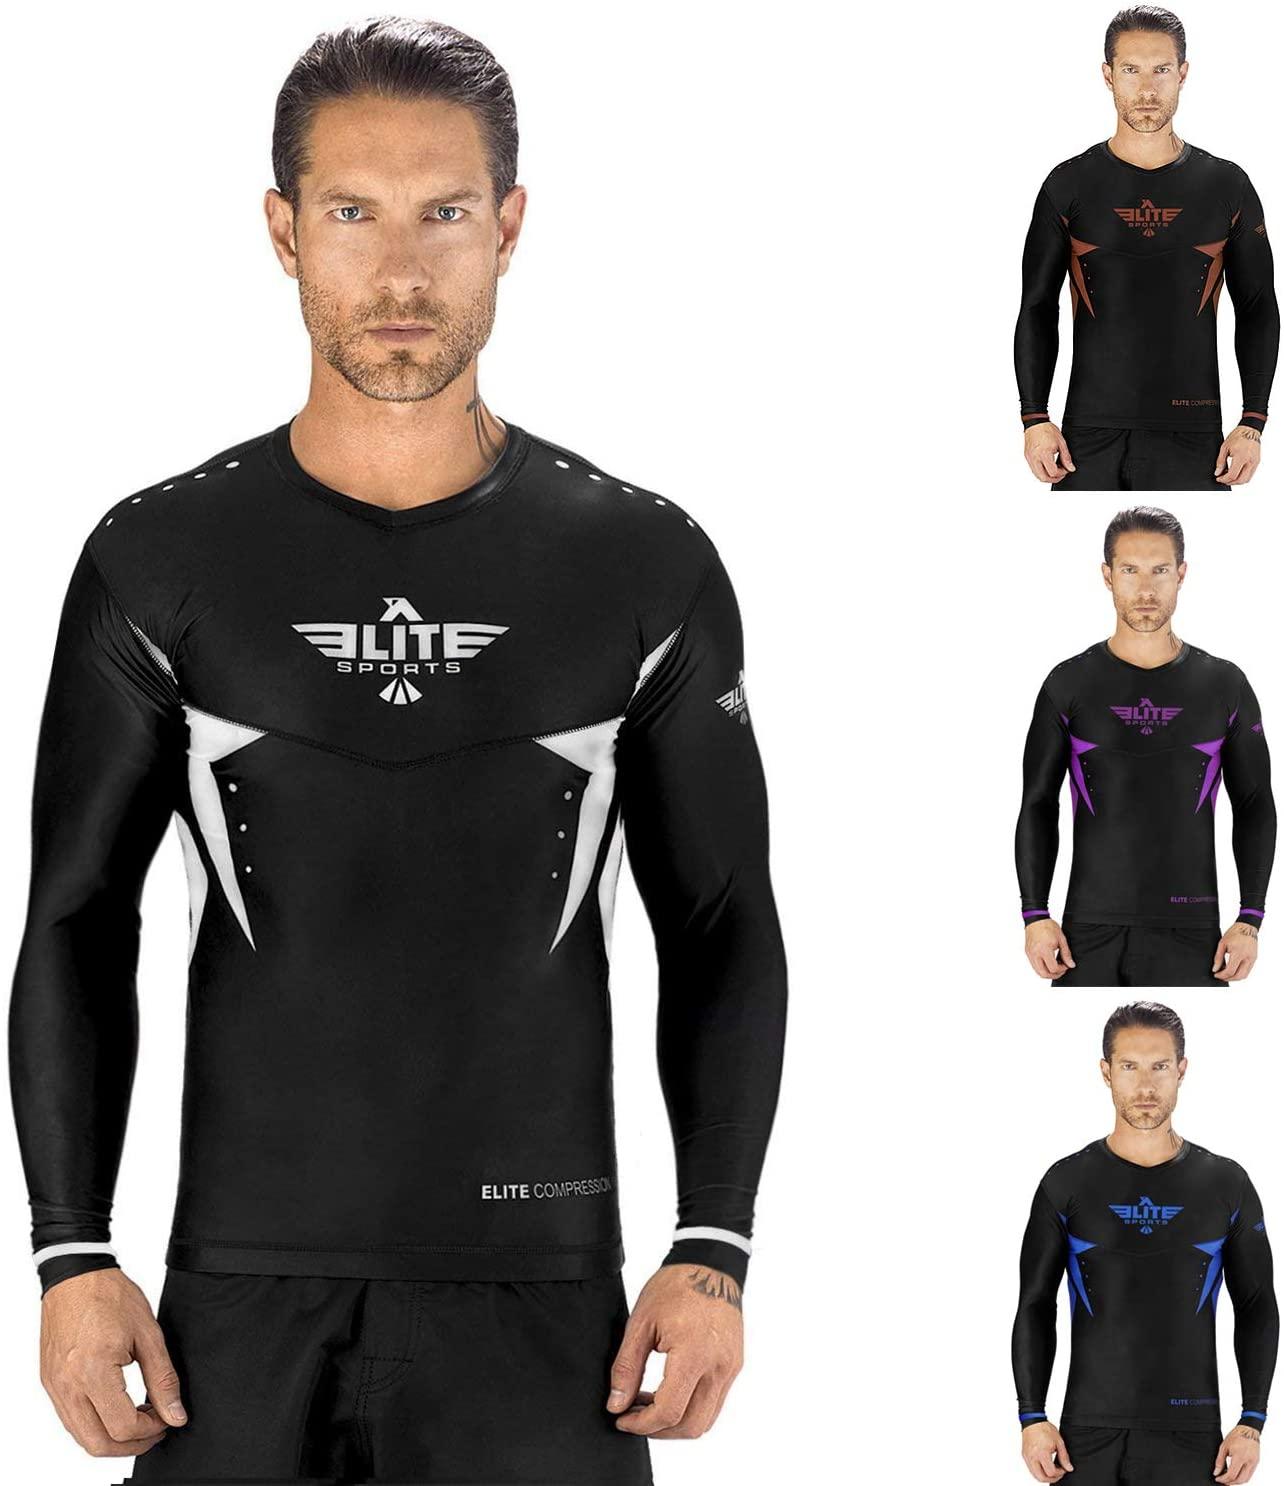 Elite Sports Star Full Sleeve Compression, MMA, BJJ, No-Gi, Cross Training Rash Guard